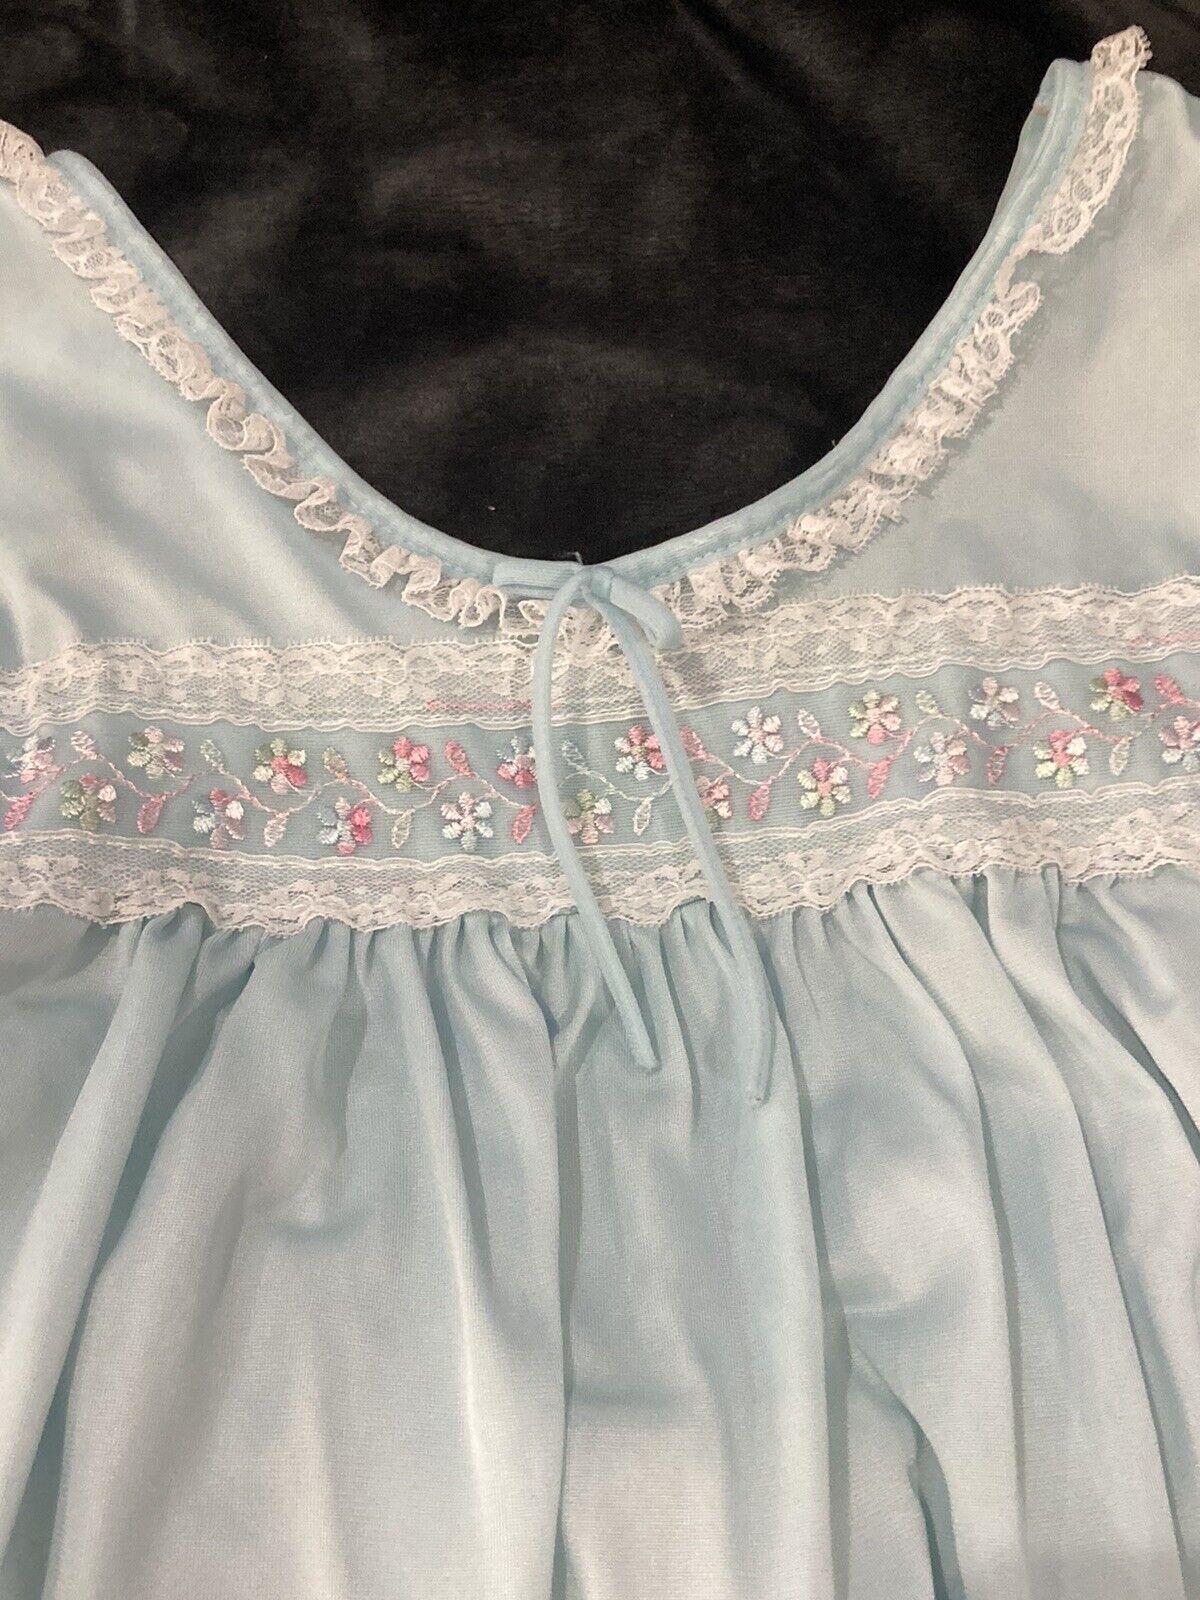 vintage cottagecore dress - image 2